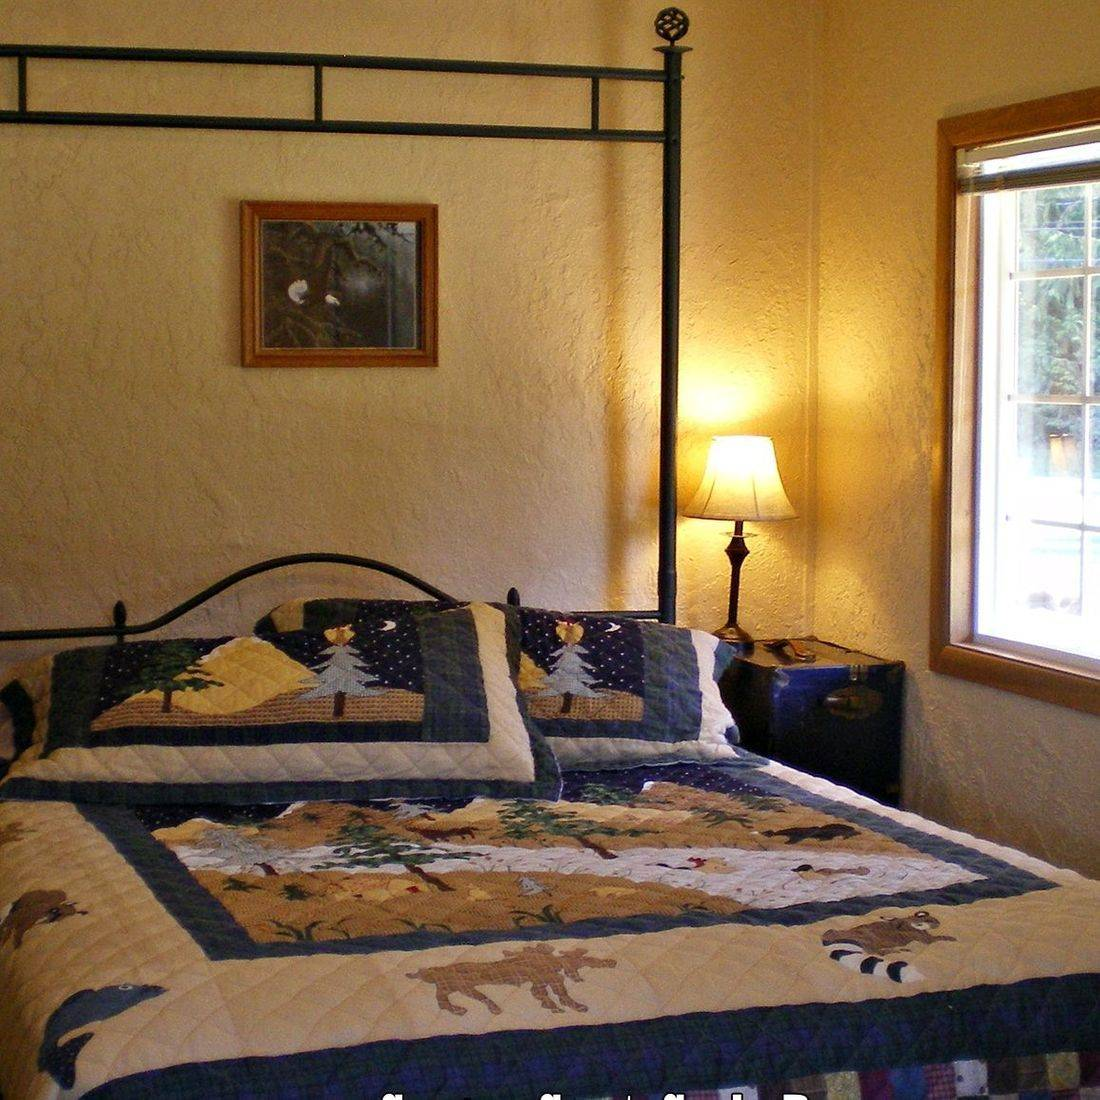 log cabins in Concrete, North Cascades, Washington, lodging, hotels